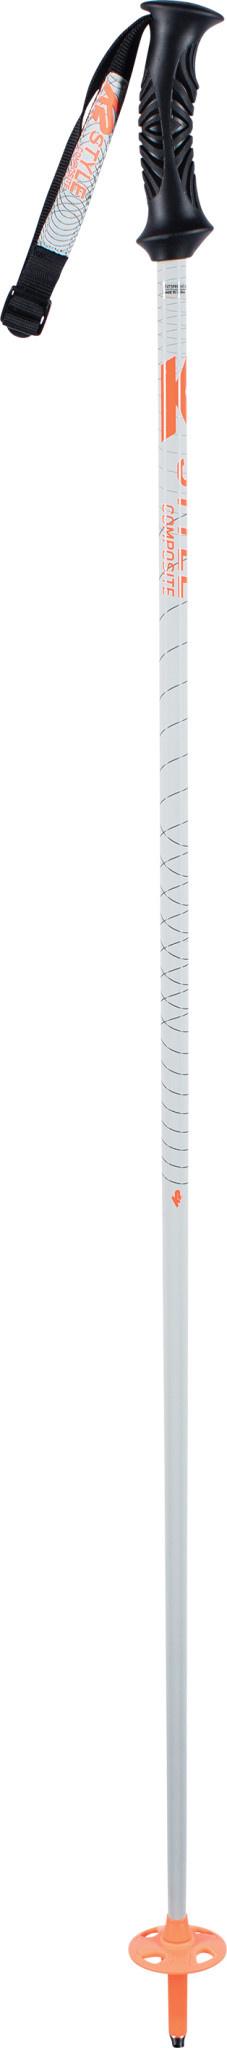 K2 K2 Women's Style Composite Ski Pole